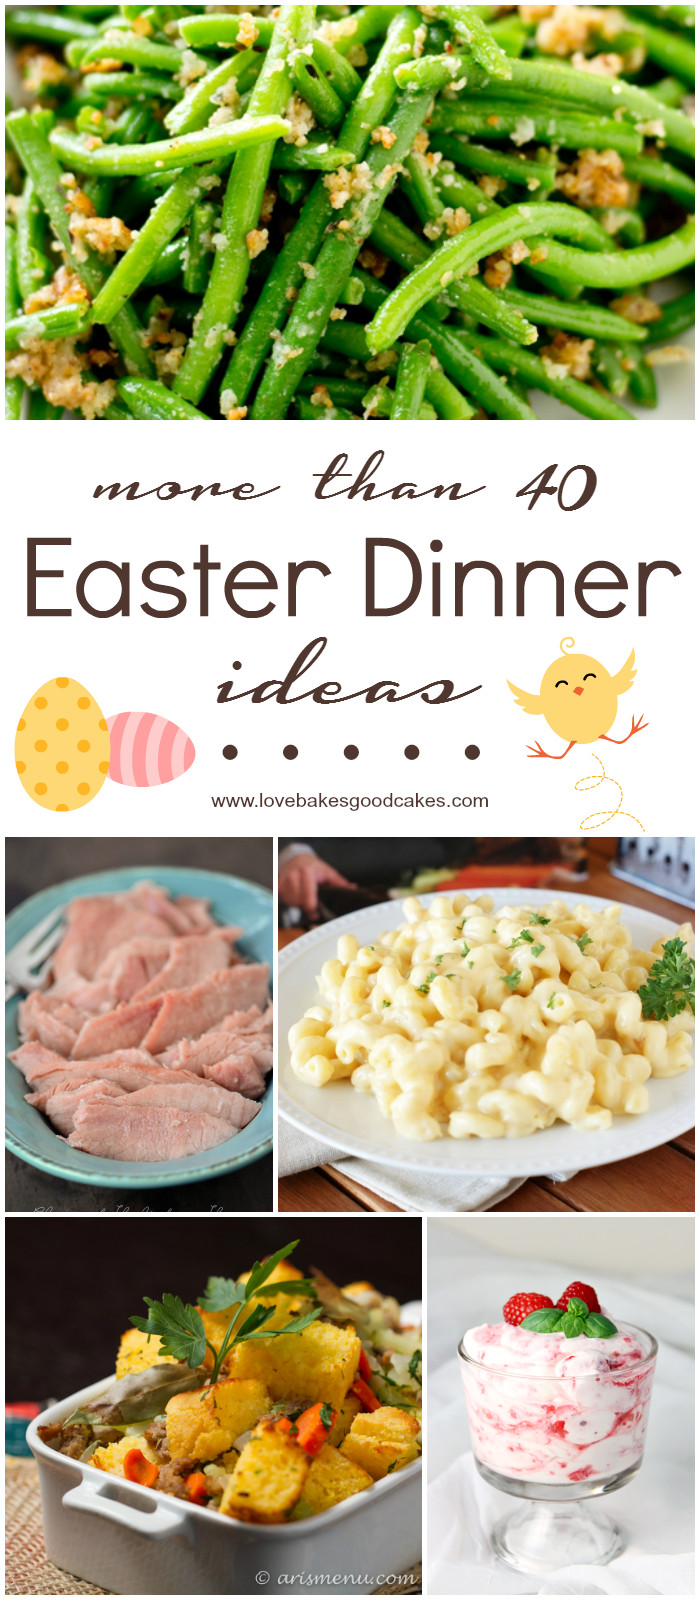 Easter Dinner Recipes Ideas  More than 40 Easter Dinner Ideas